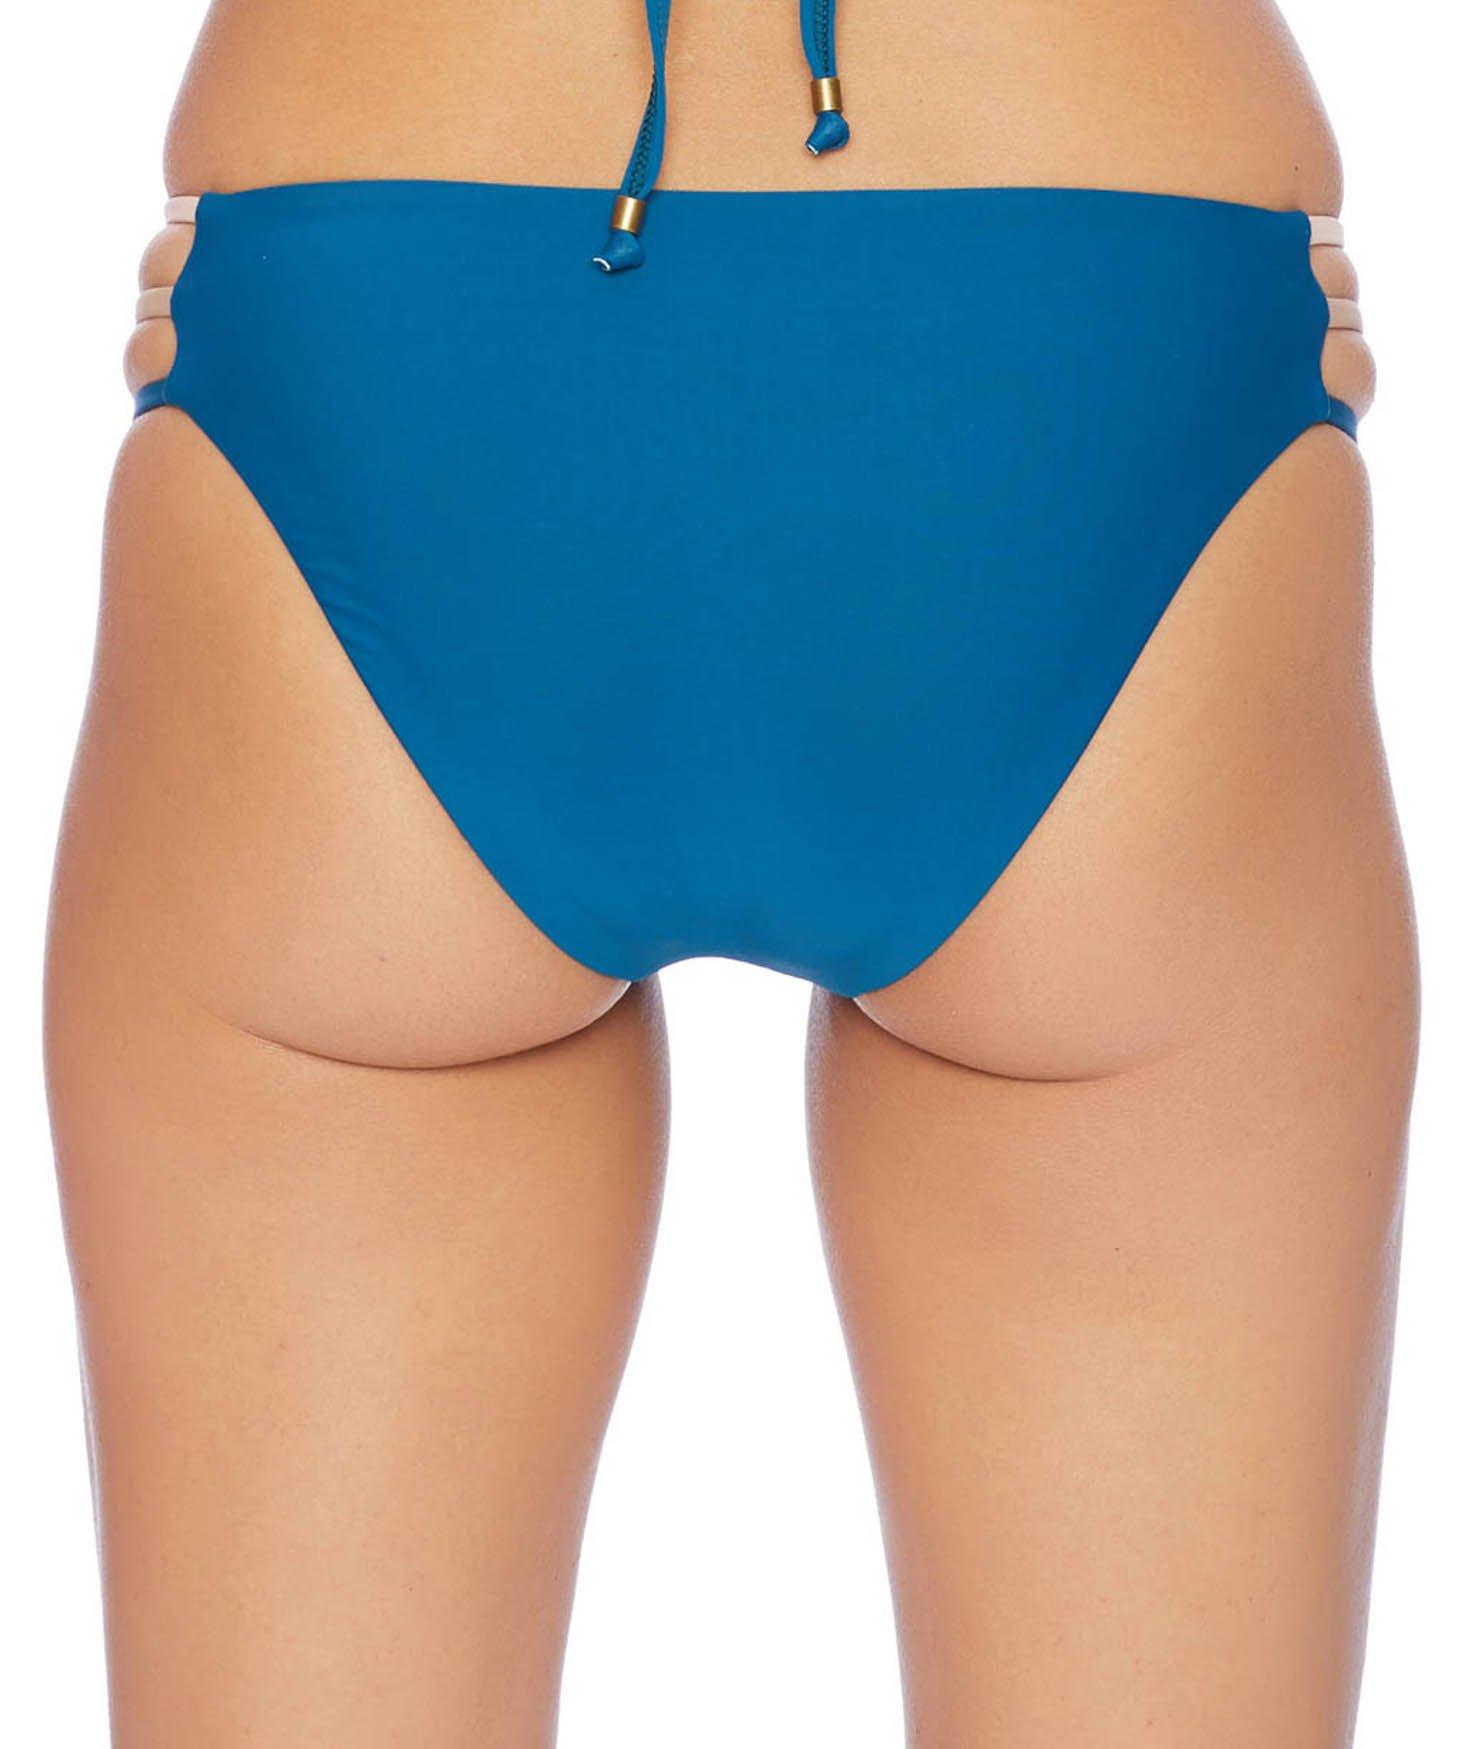 Ella Moss Women's Multi Side Strap Swimsuit Bikini Bottom, Neapolitan Cape Blue, X-Small by Ella Moss (Image #2)